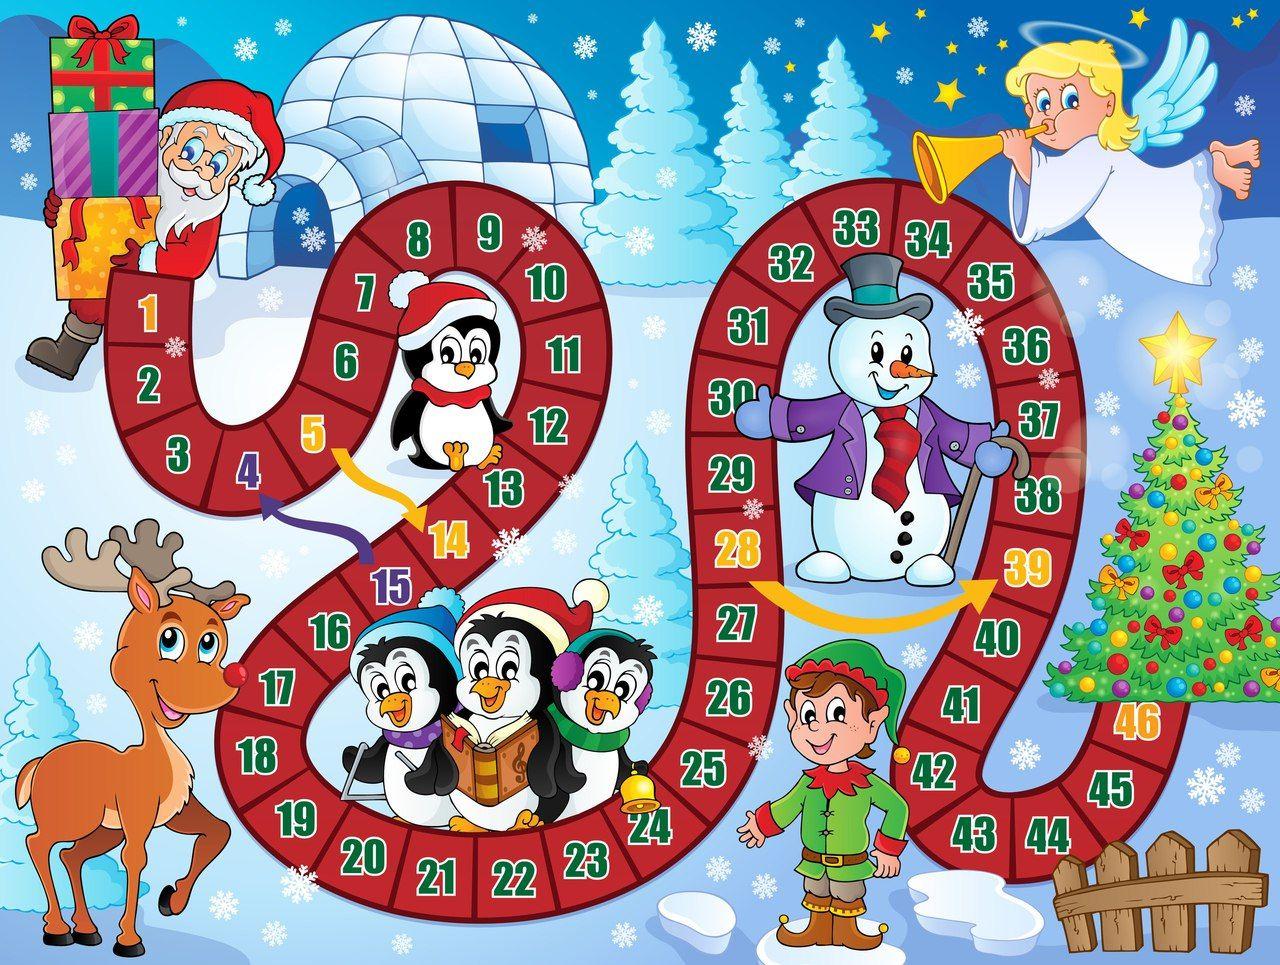 Juegos Con Dados Manualidades Navidad Pinterest Christmas